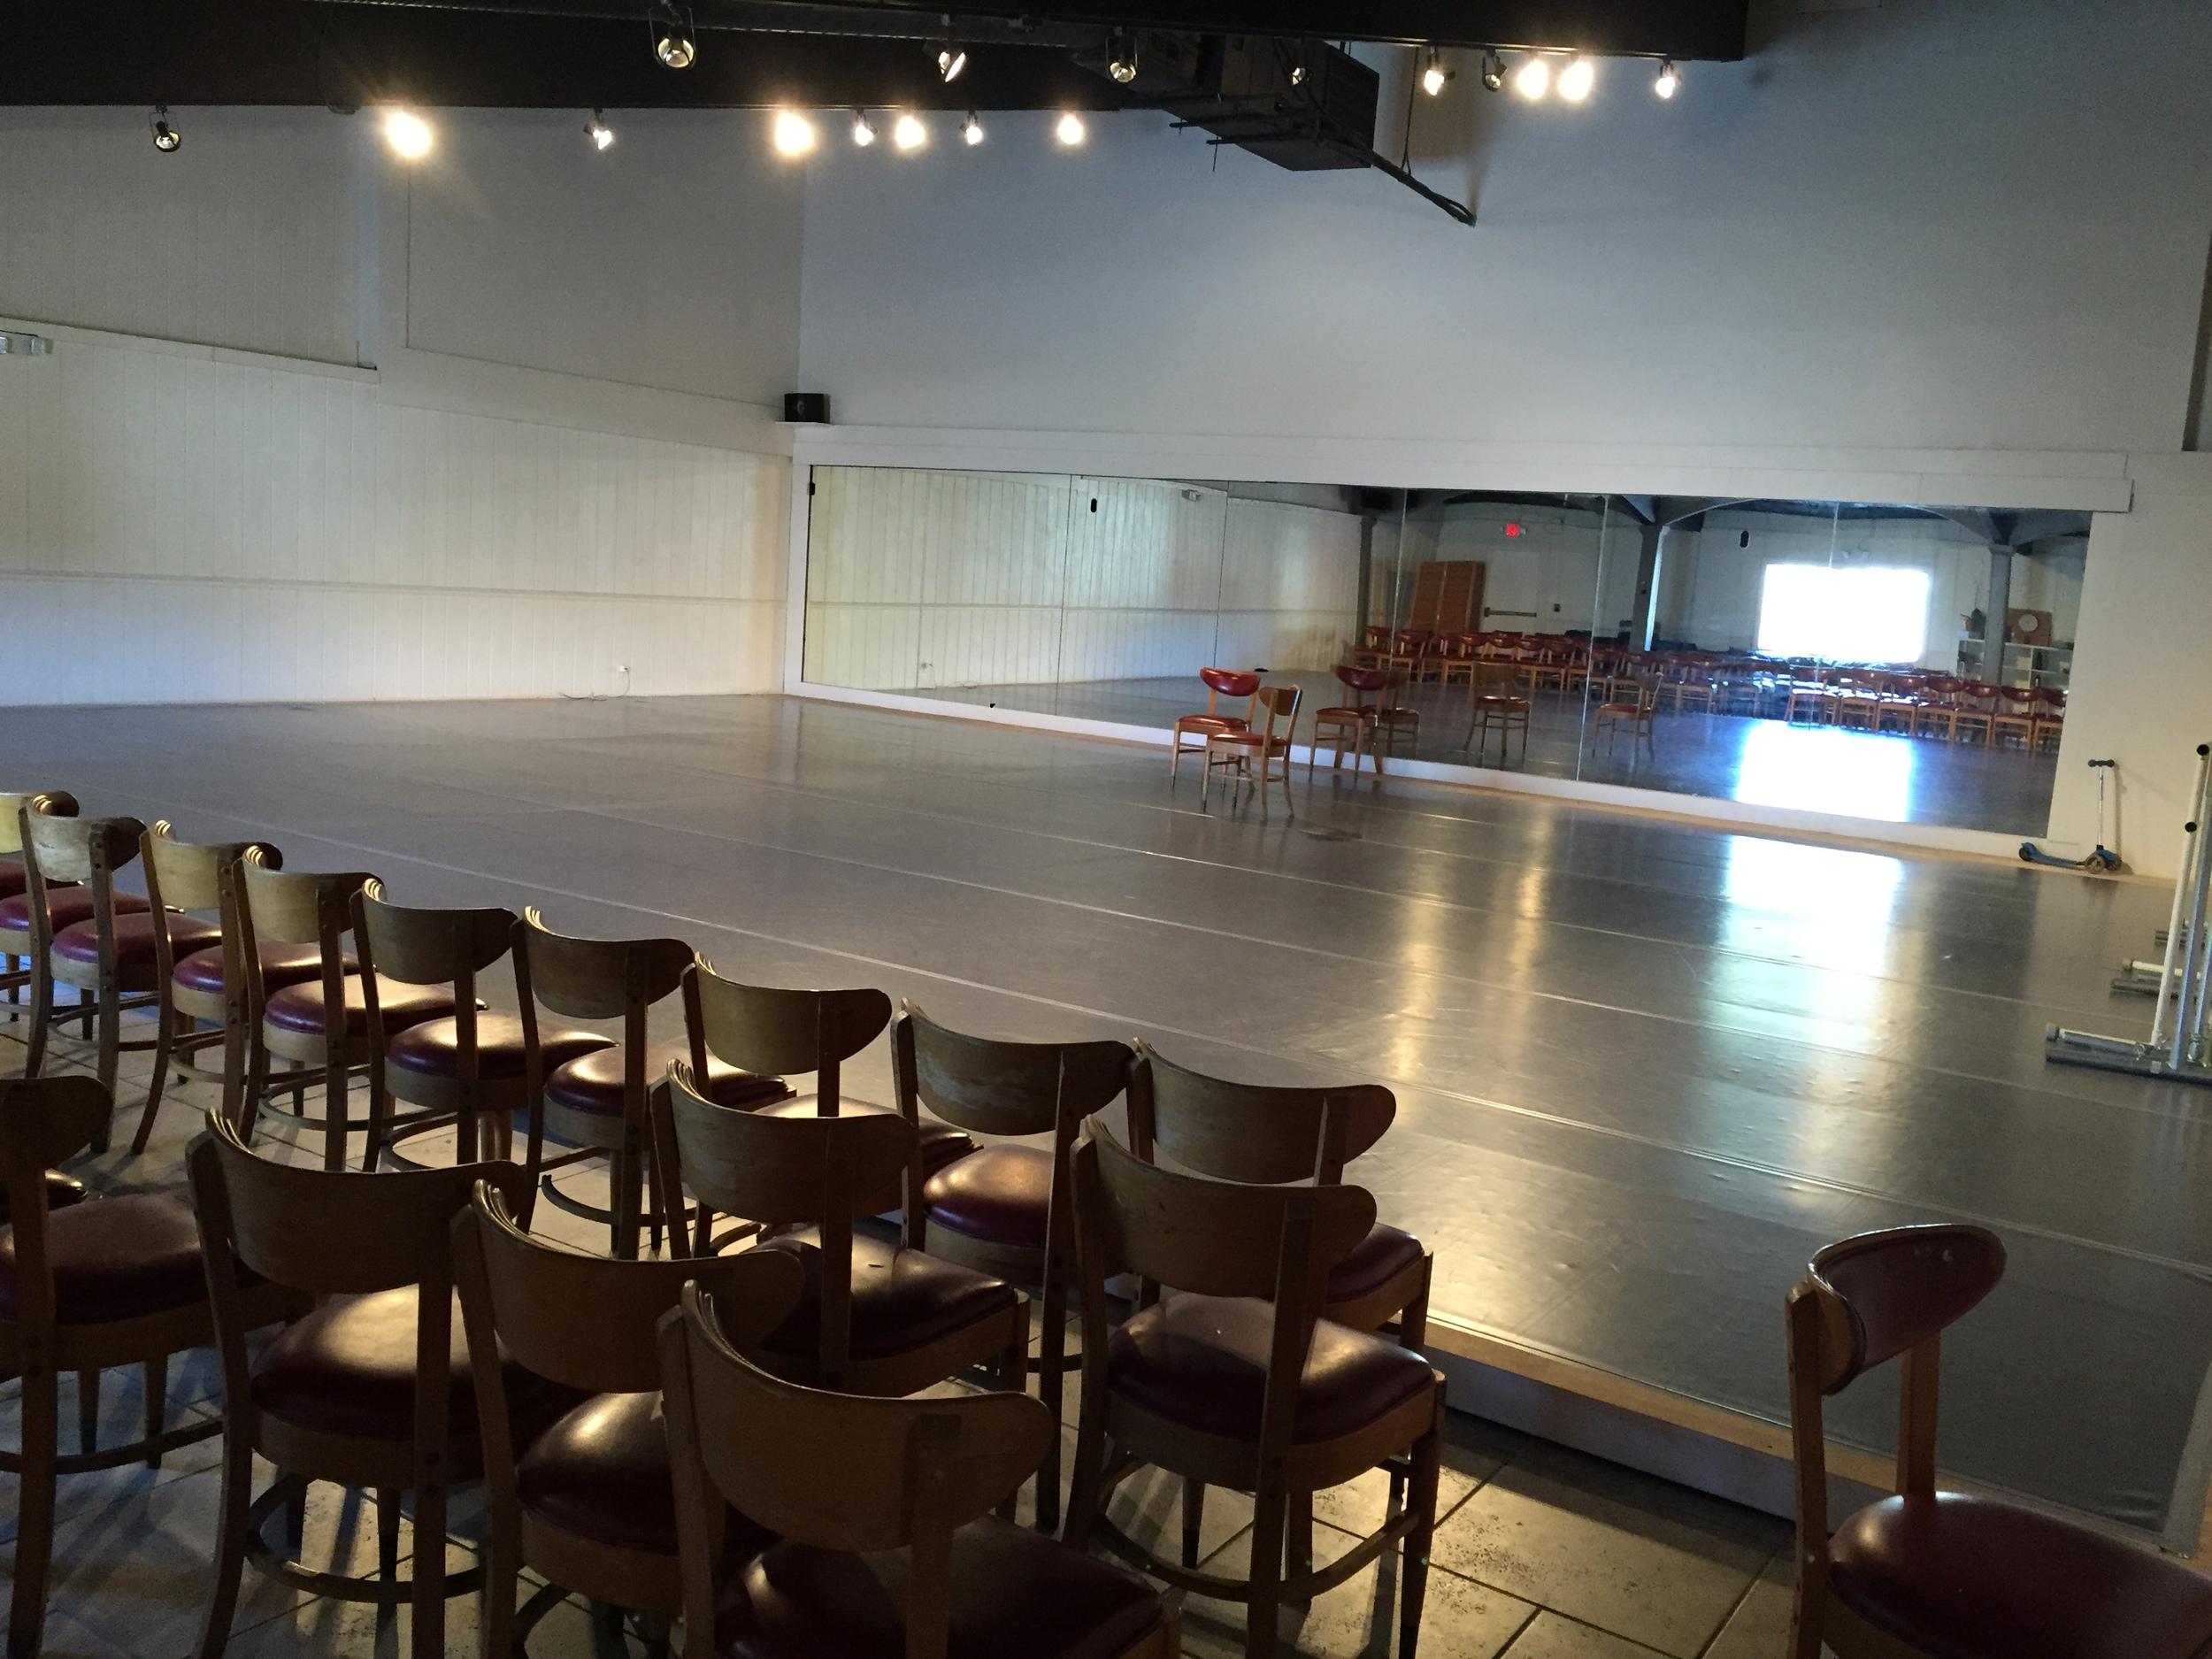 The Cramazing Dance Studio